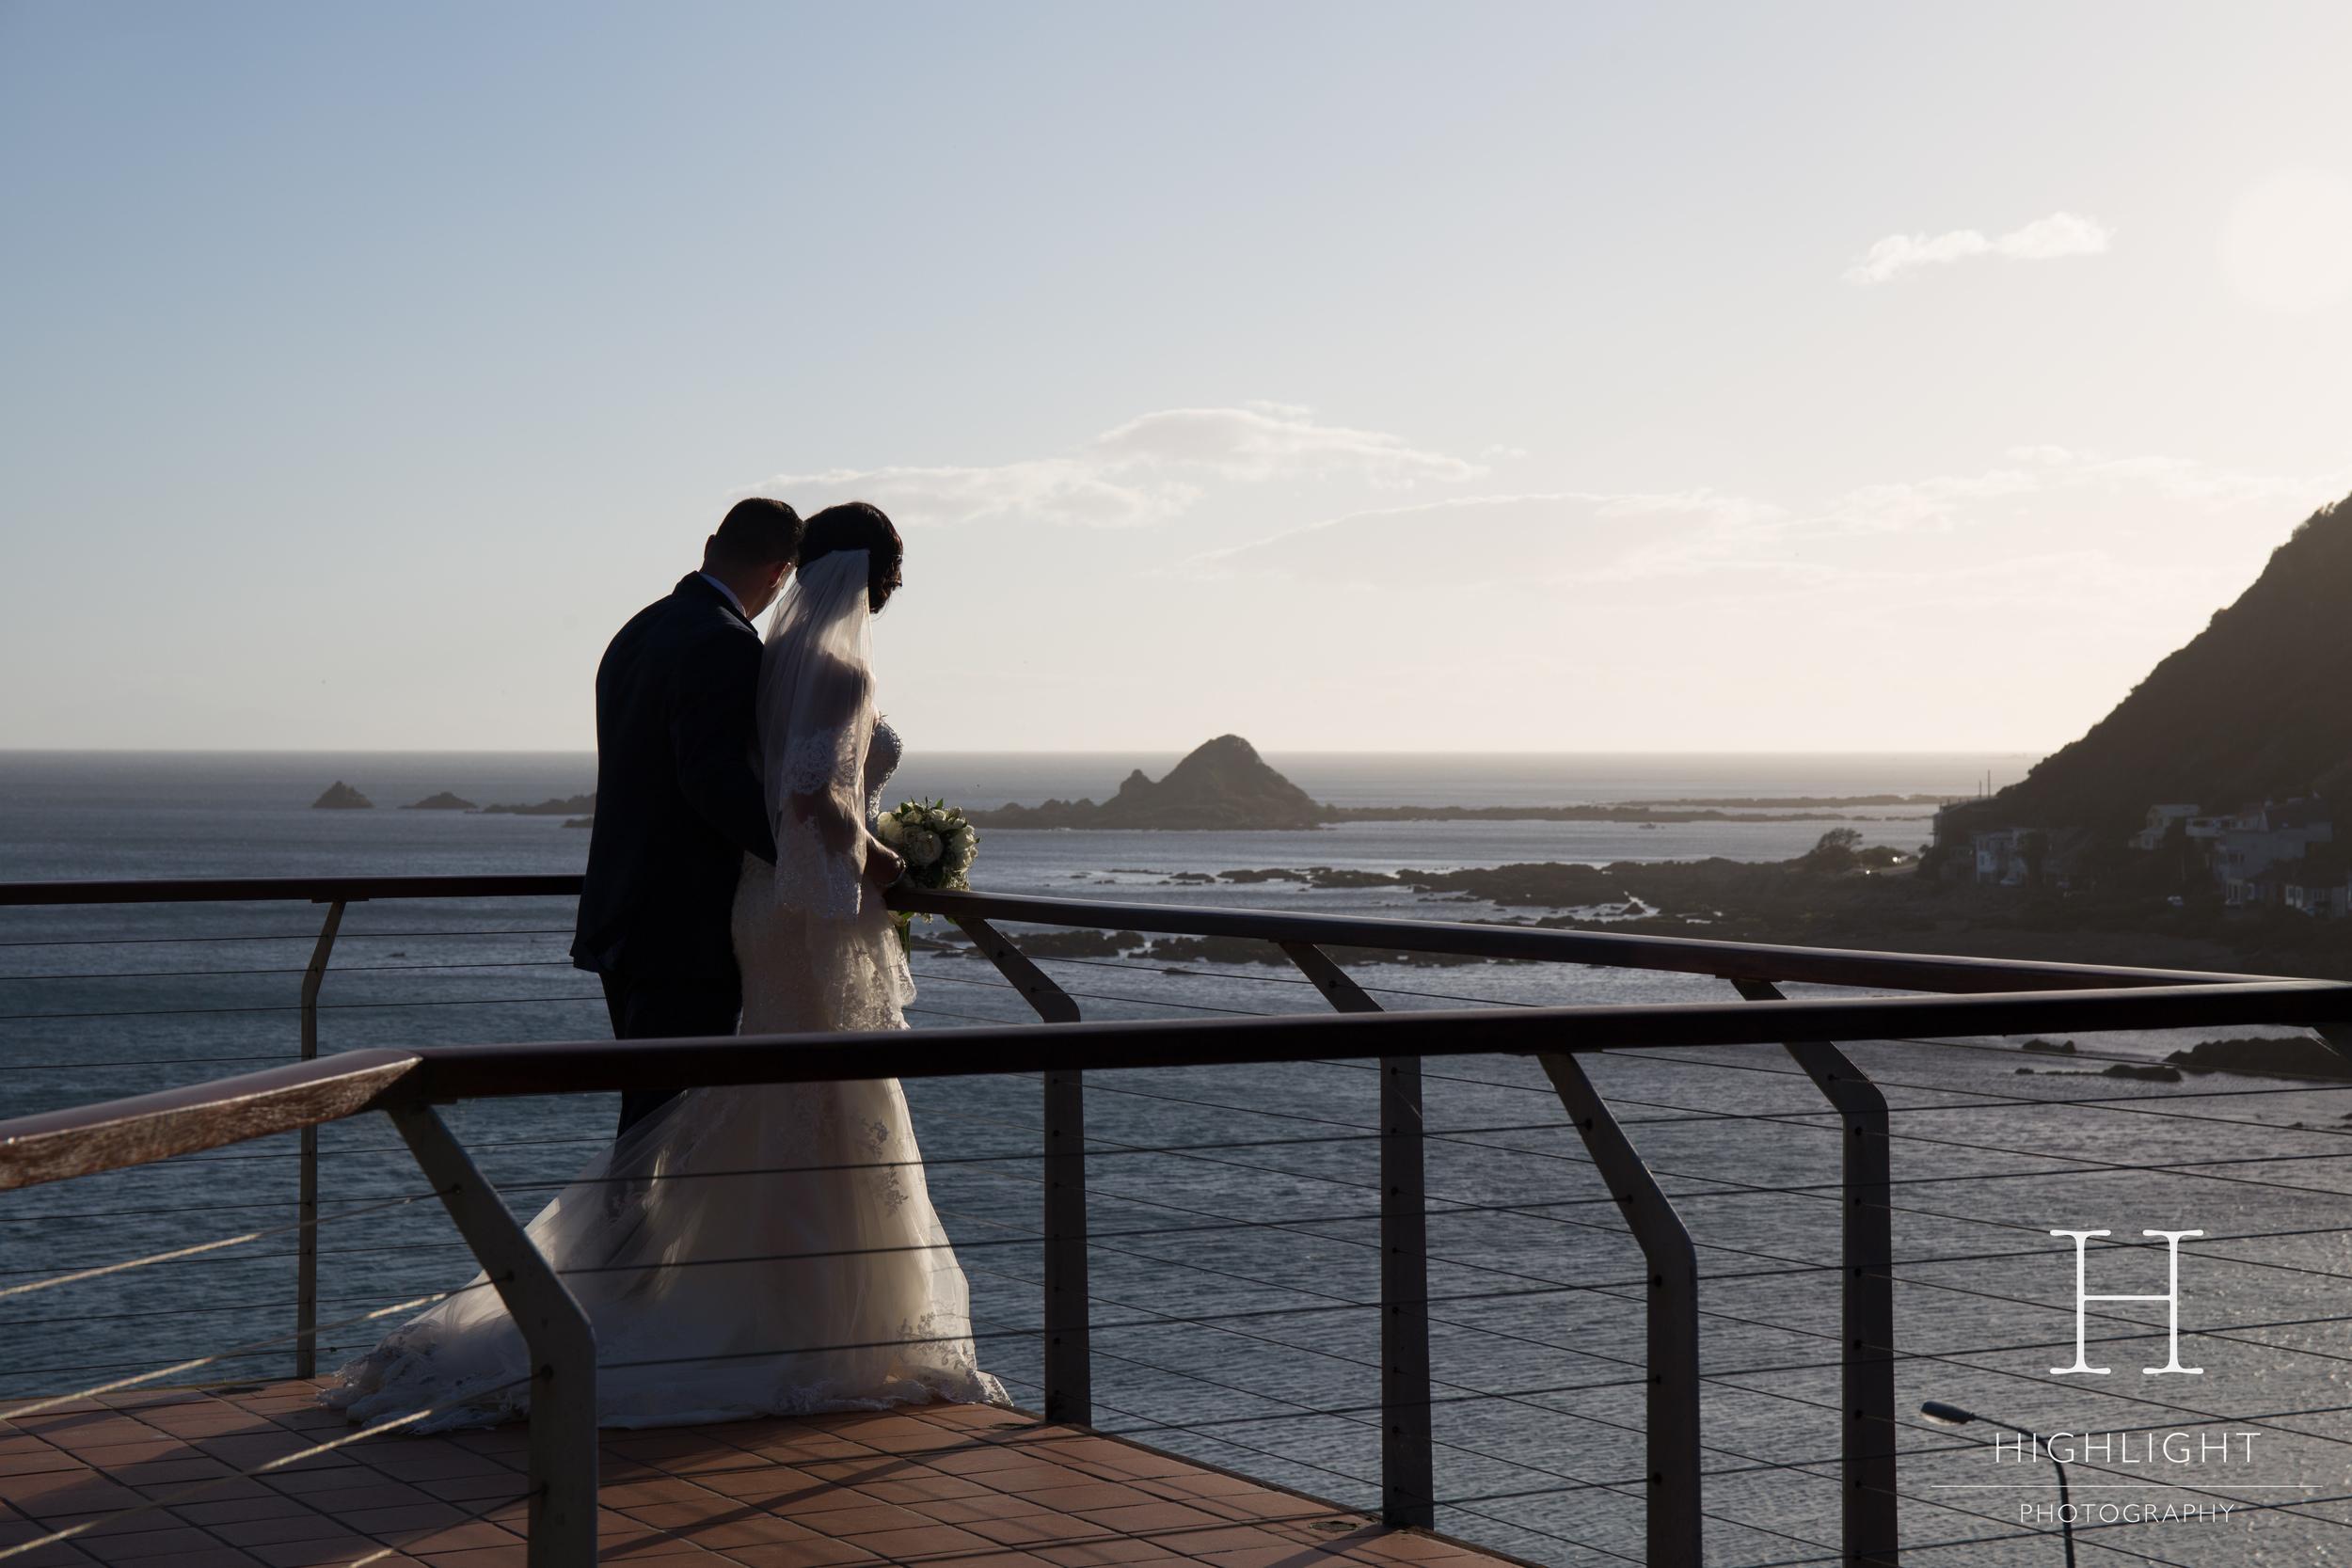 highlight_photography_wedding_new_zealand_balcony.jpg